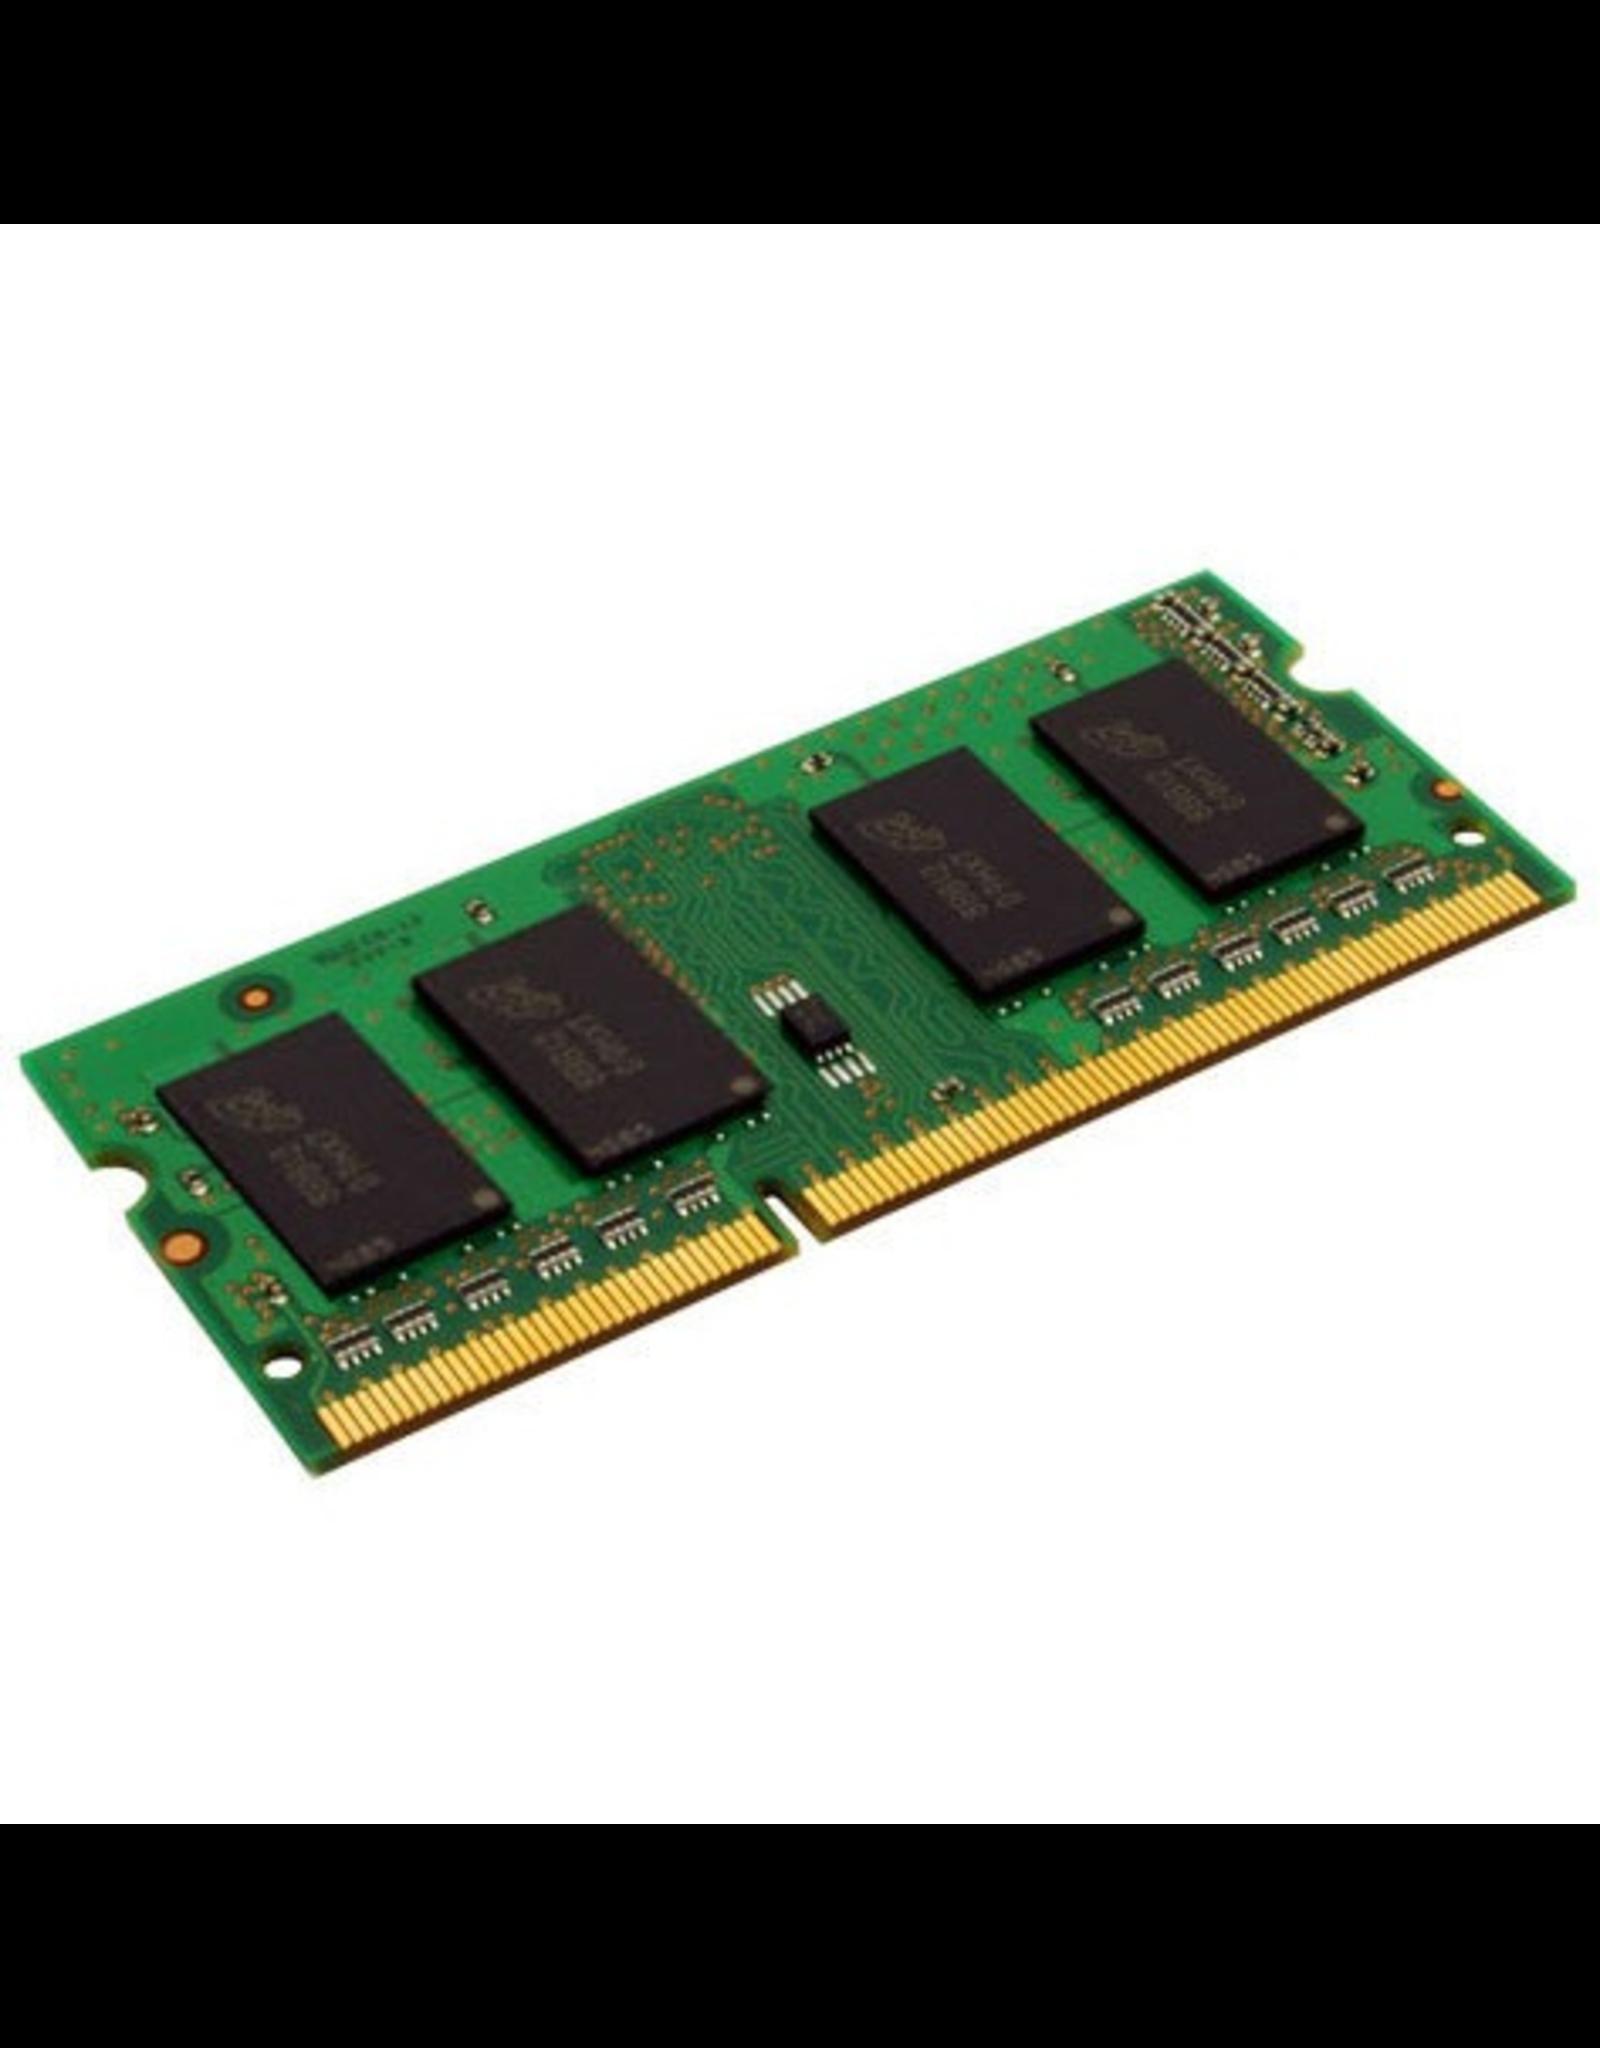 iLove Computers 8GB 1066Mhz (PC8500) DDR3 SODIMM 204 pin RAM Module